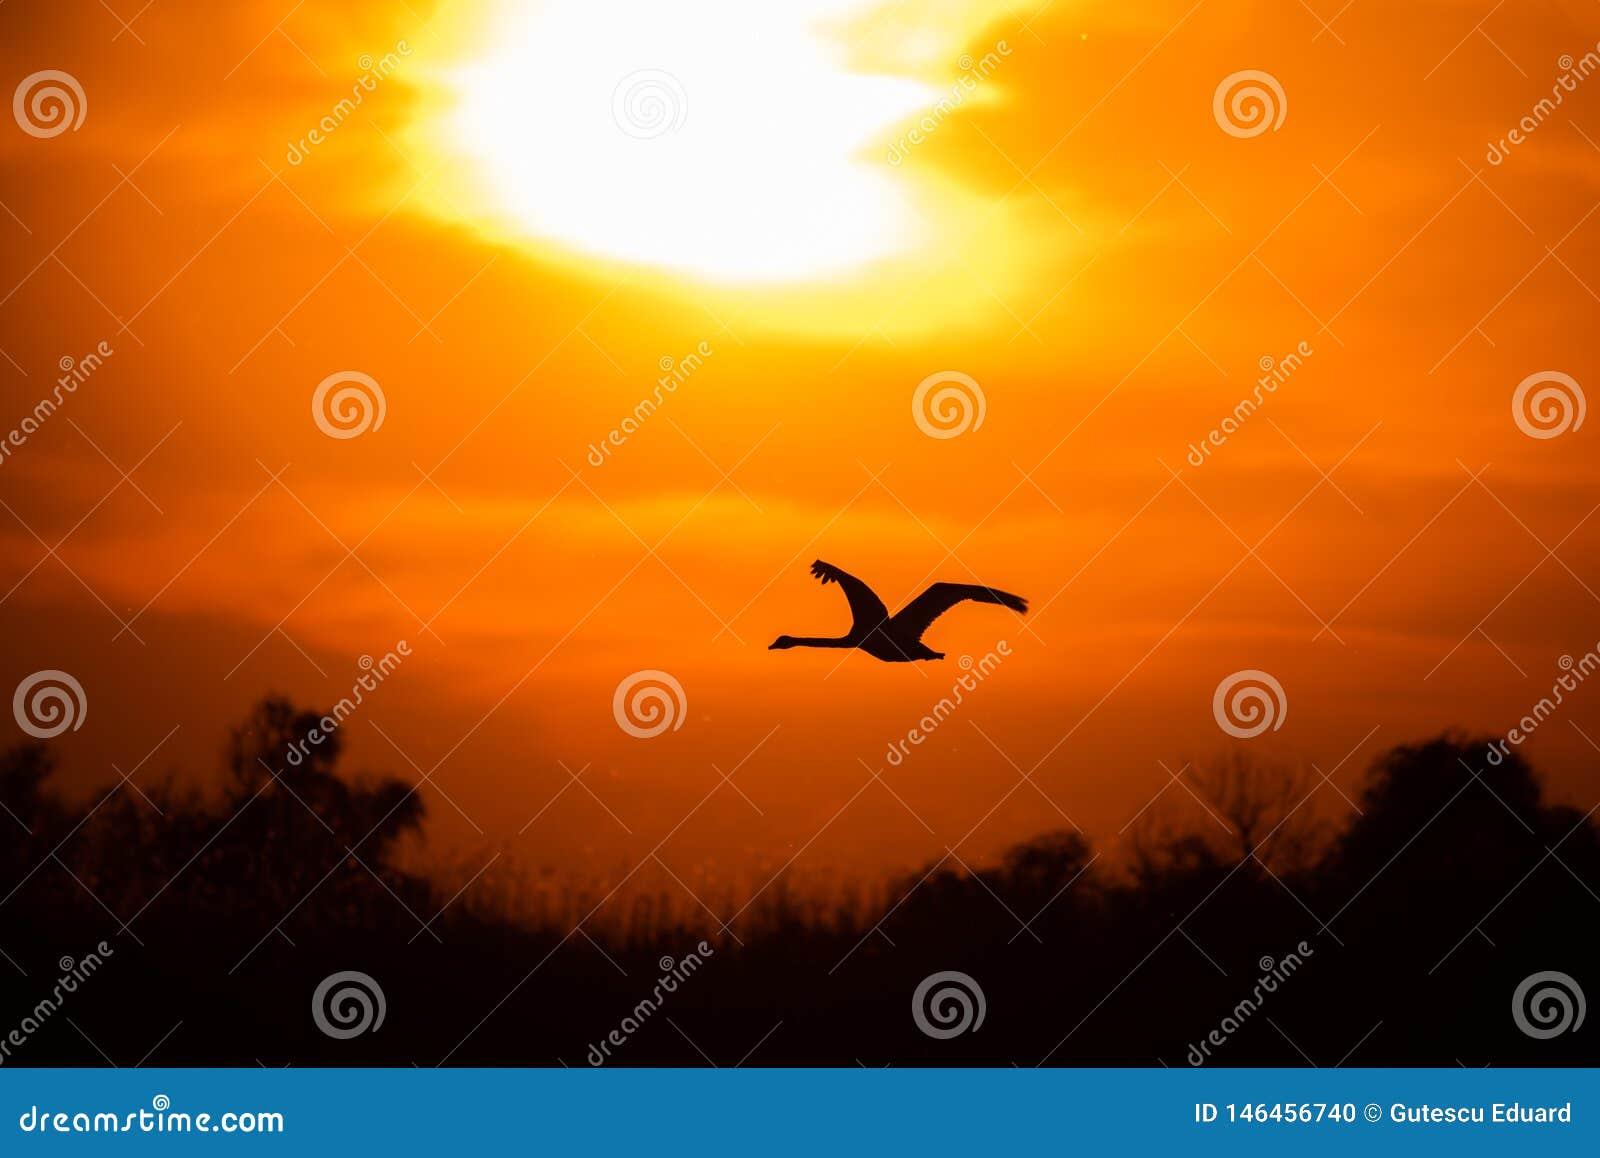 Swan flying at sunset in Danube Delta , Romania wildlife bird watching